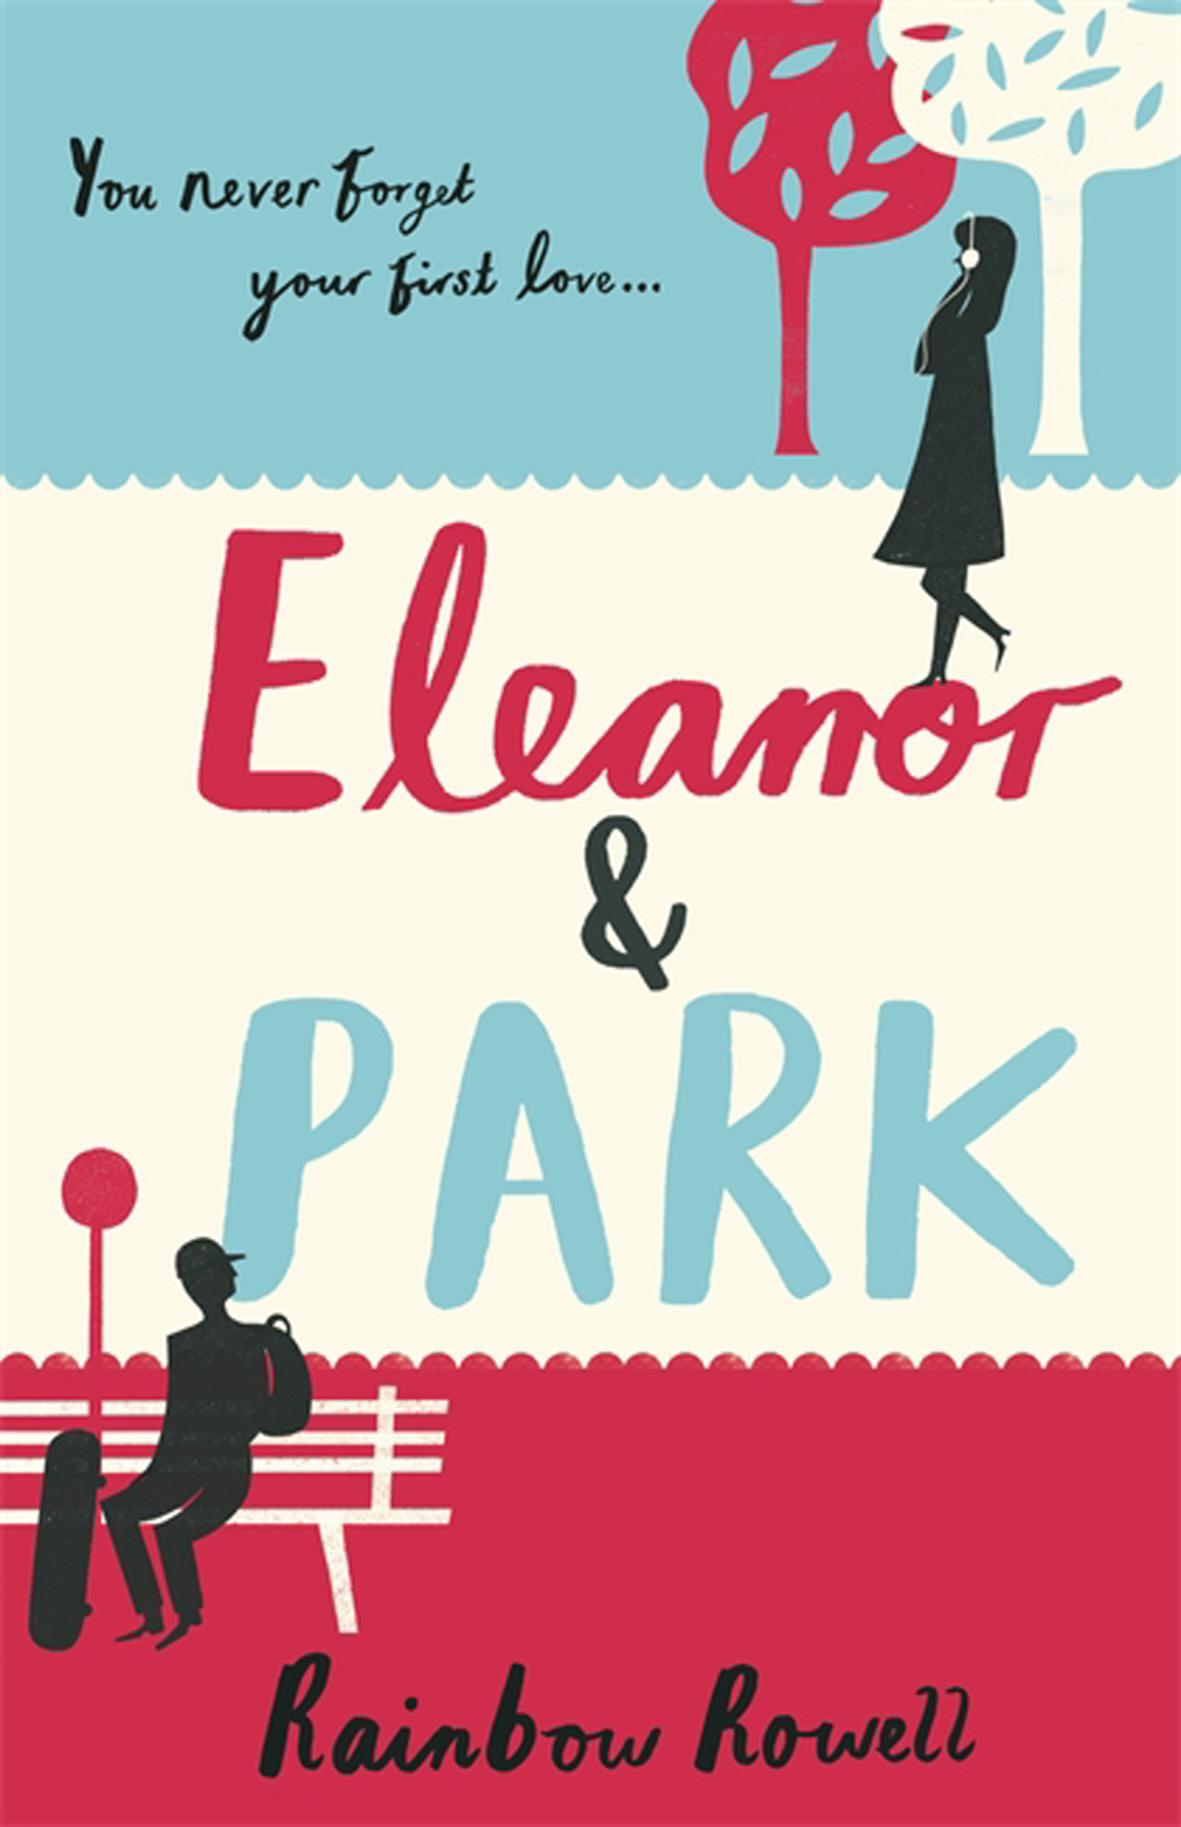 https://i0.wp.com/www.ourvalleyvoice.com/wp-content/uploads/2014/01/Eleanor-Park-Book.jpg